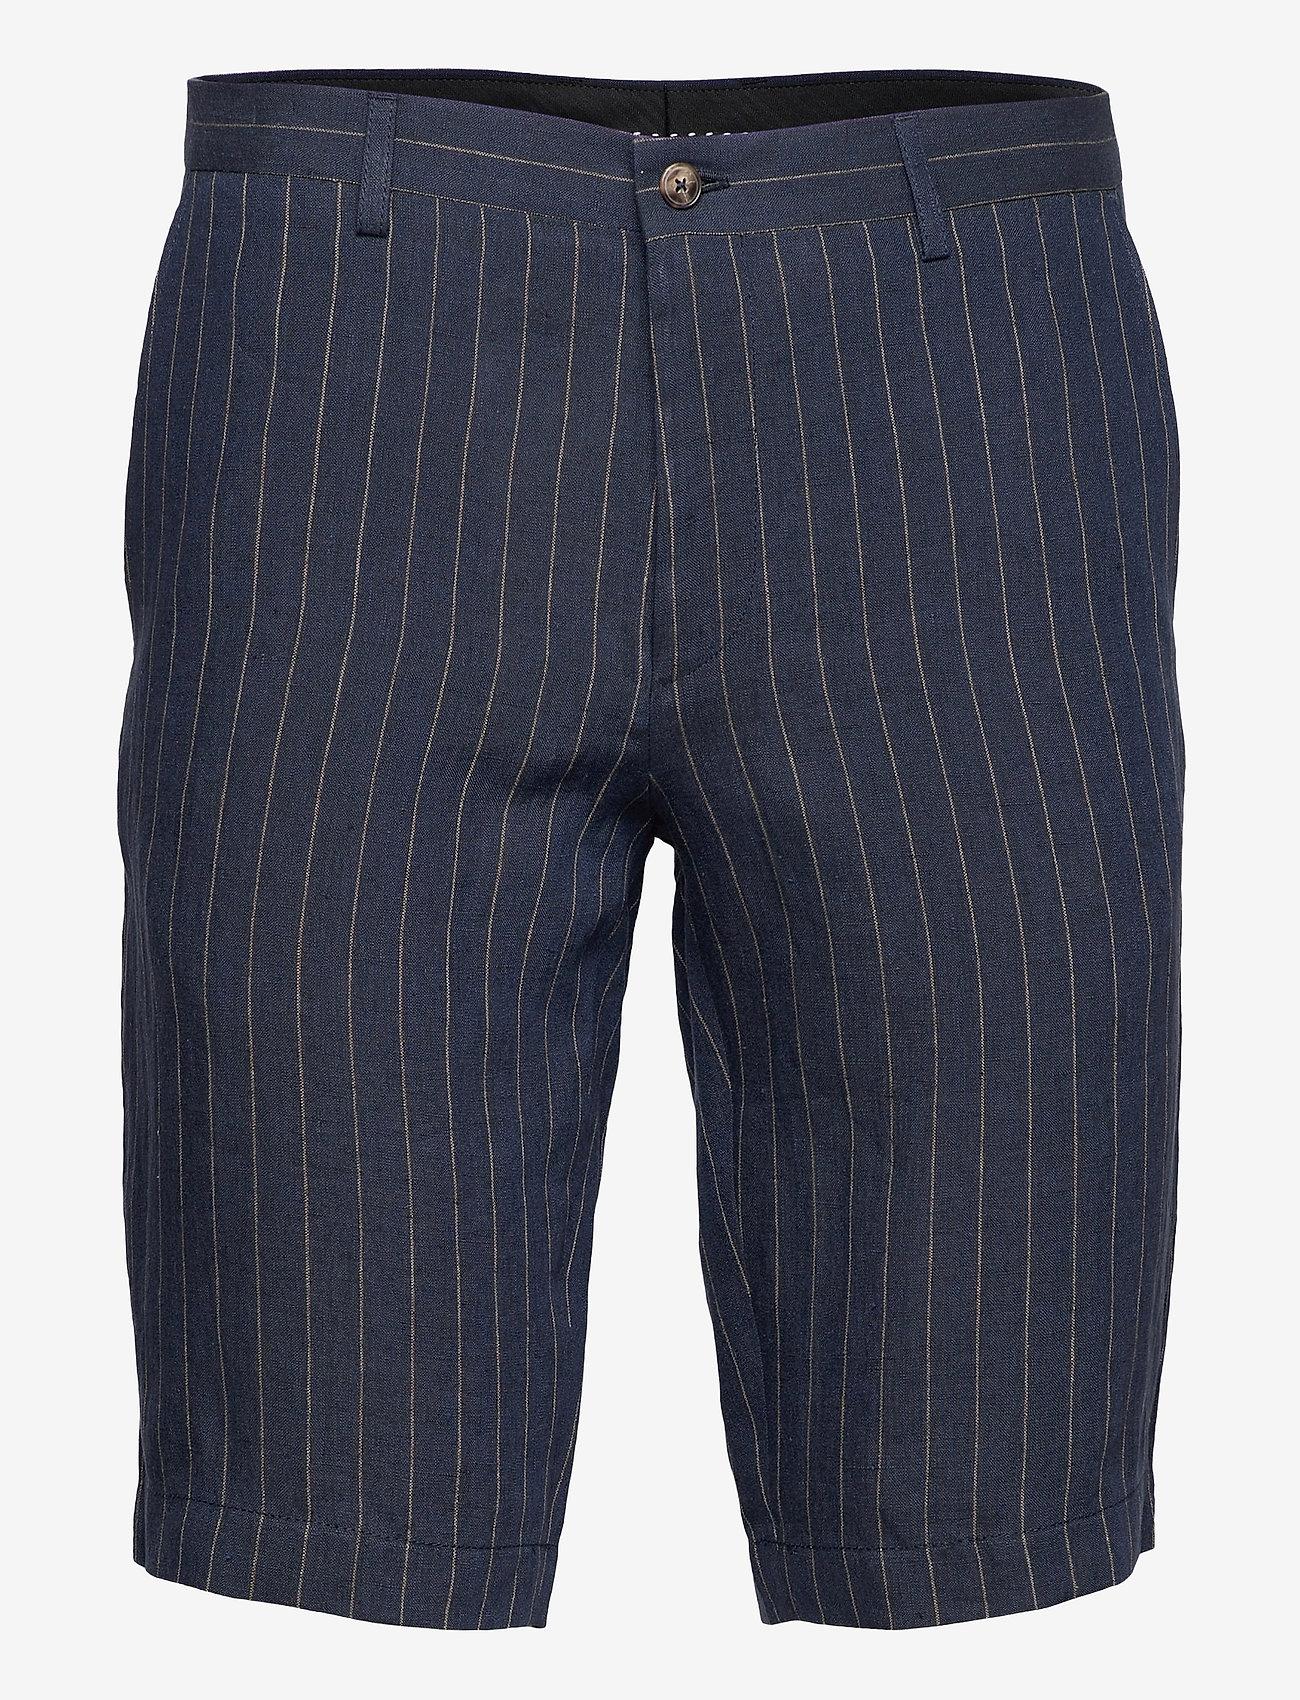 SAND - 1838 - Craig Short - casual shorts - dark blue/navy - 0